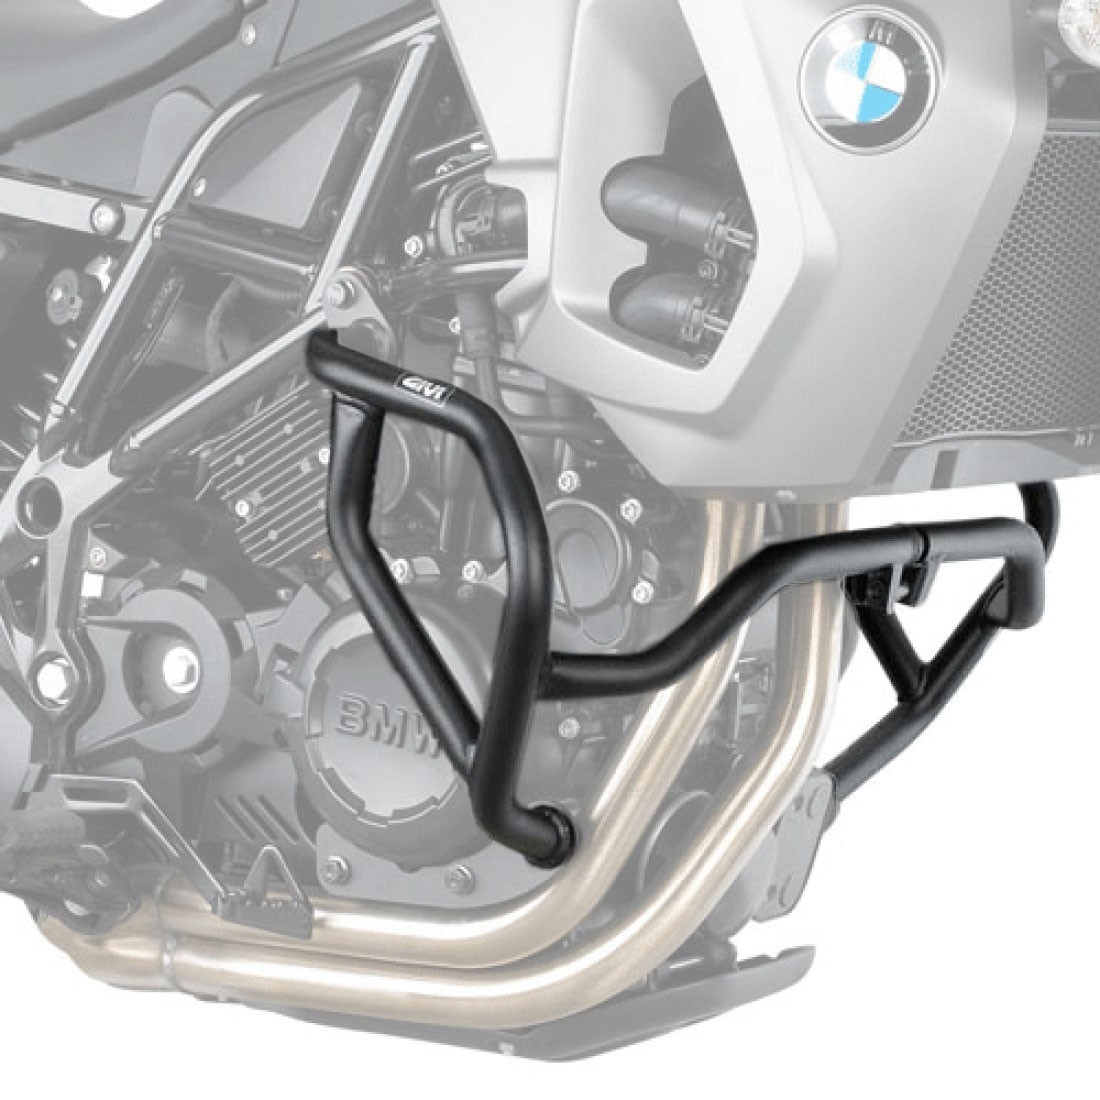 Protège moteur GIVI TN453 UNICA 0YbiAk